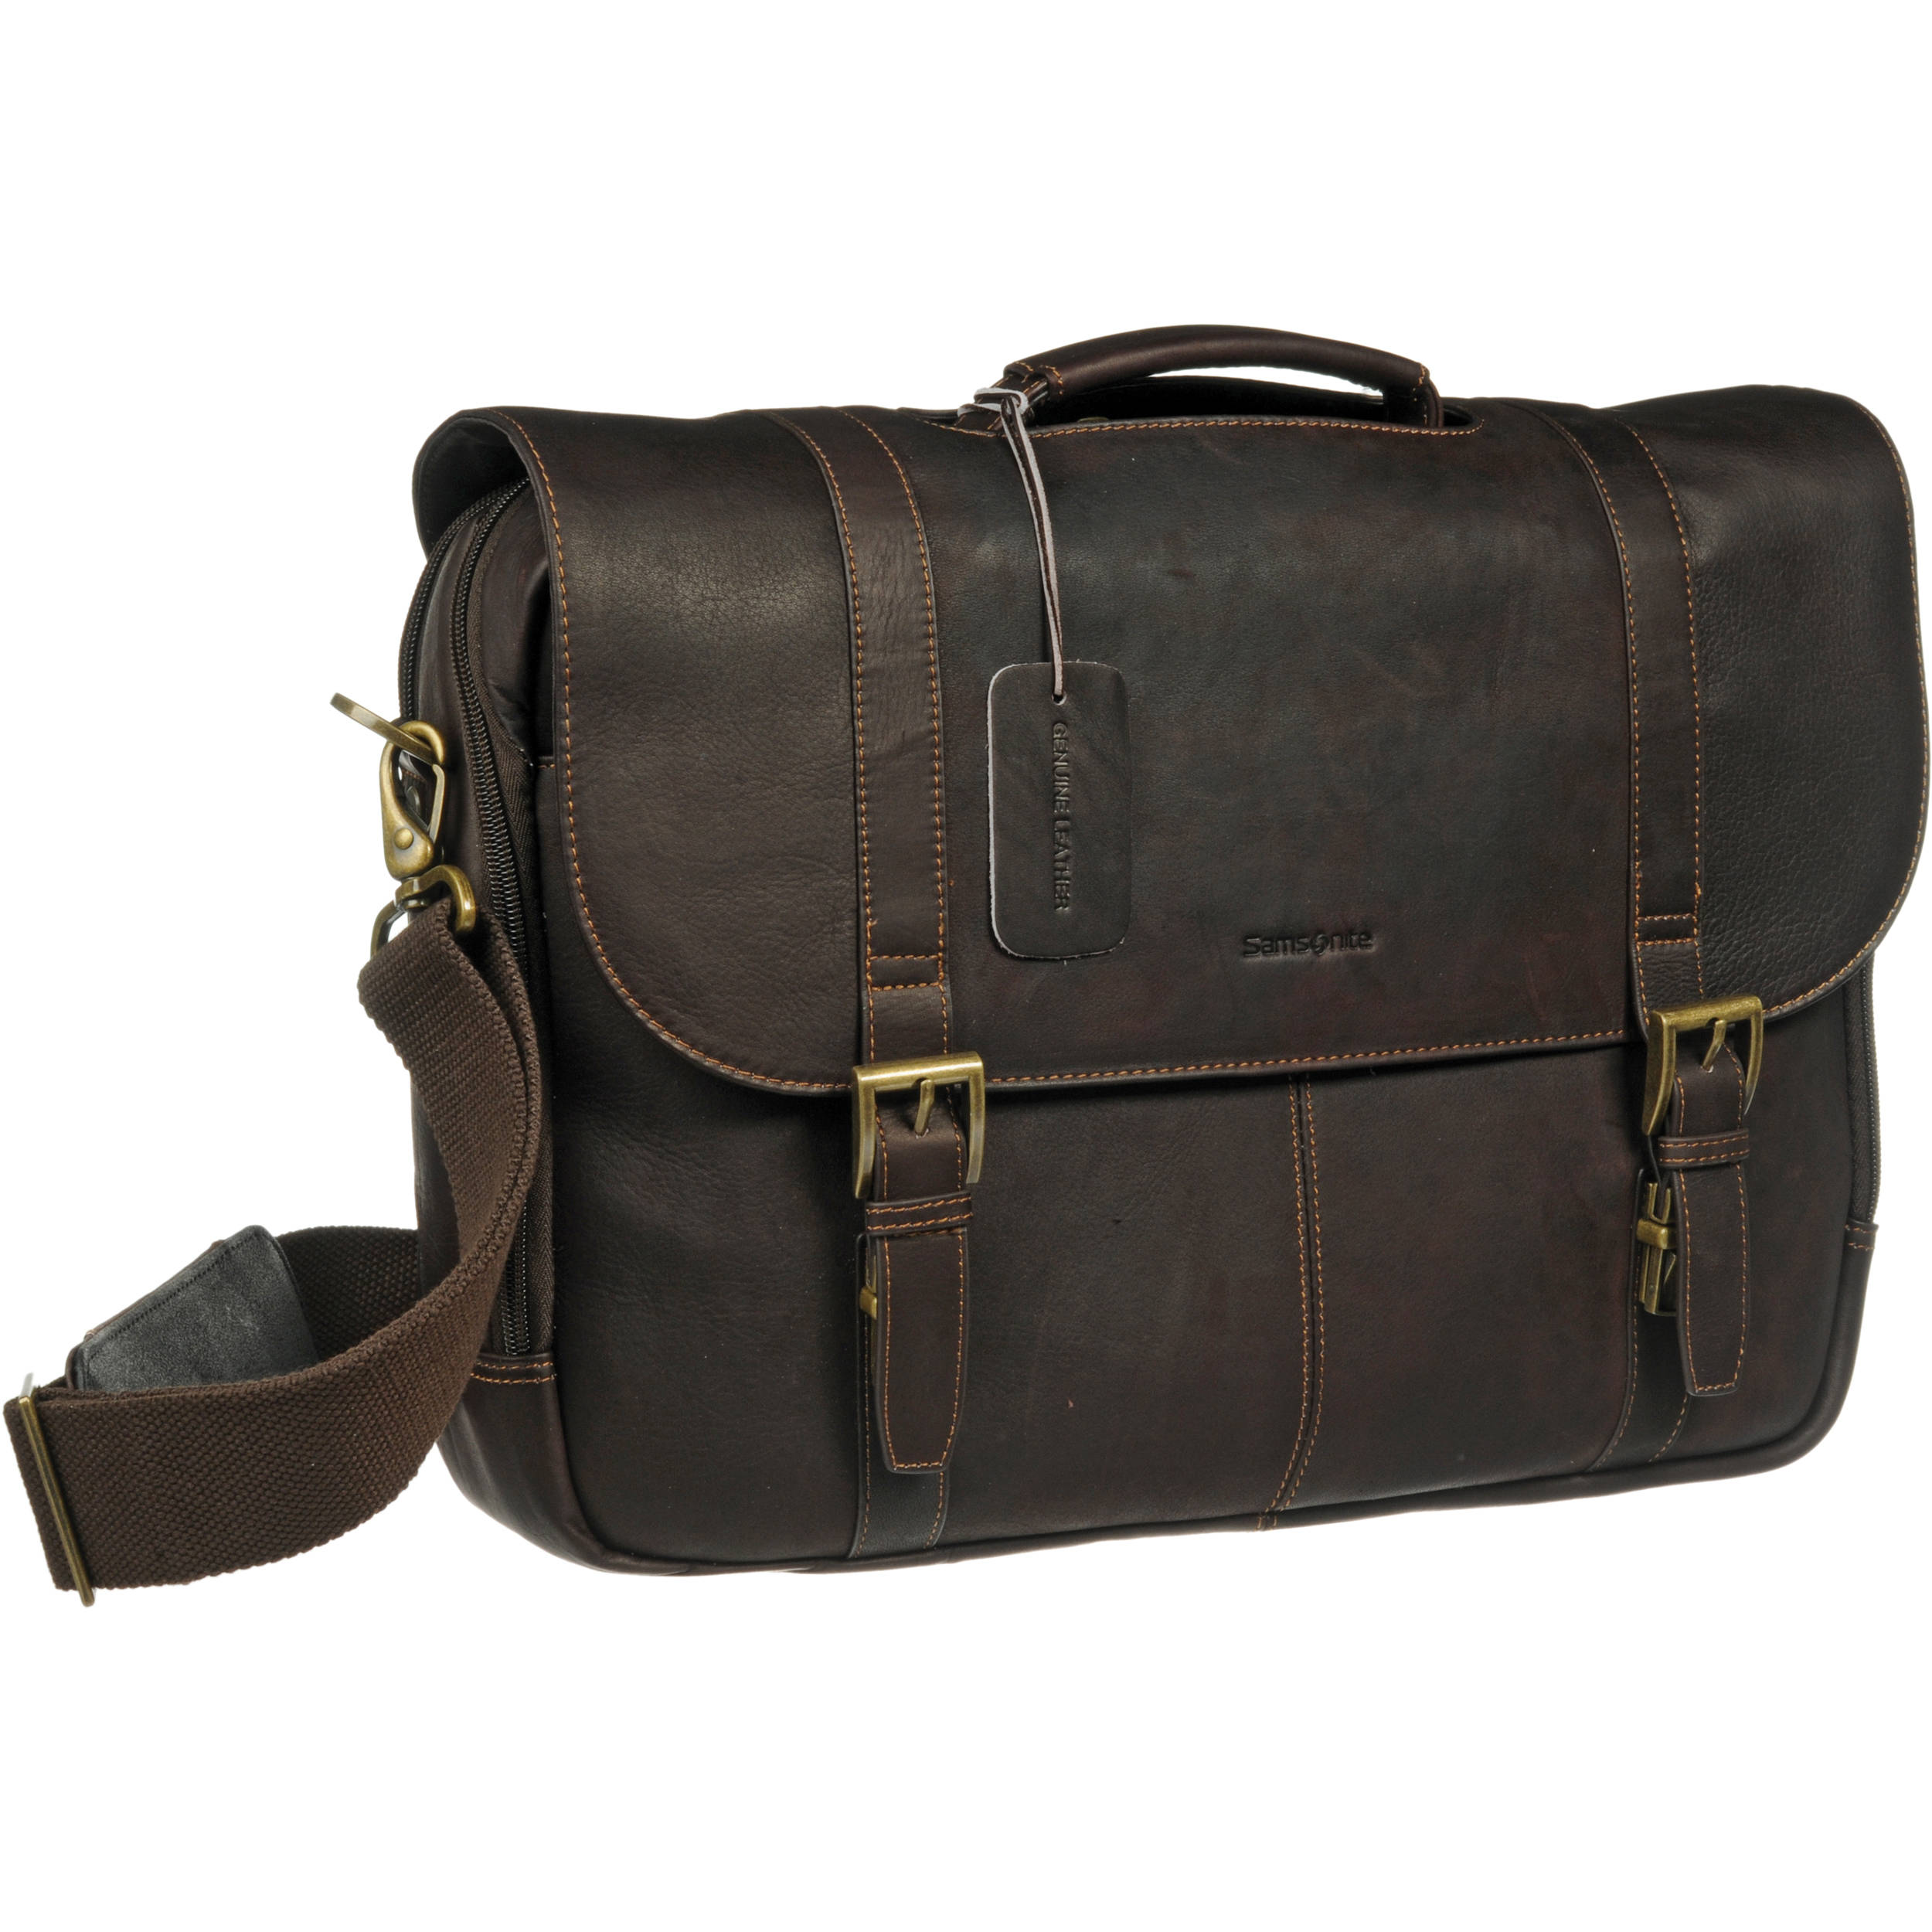 Samsonite Colombian Leather Laptop Case